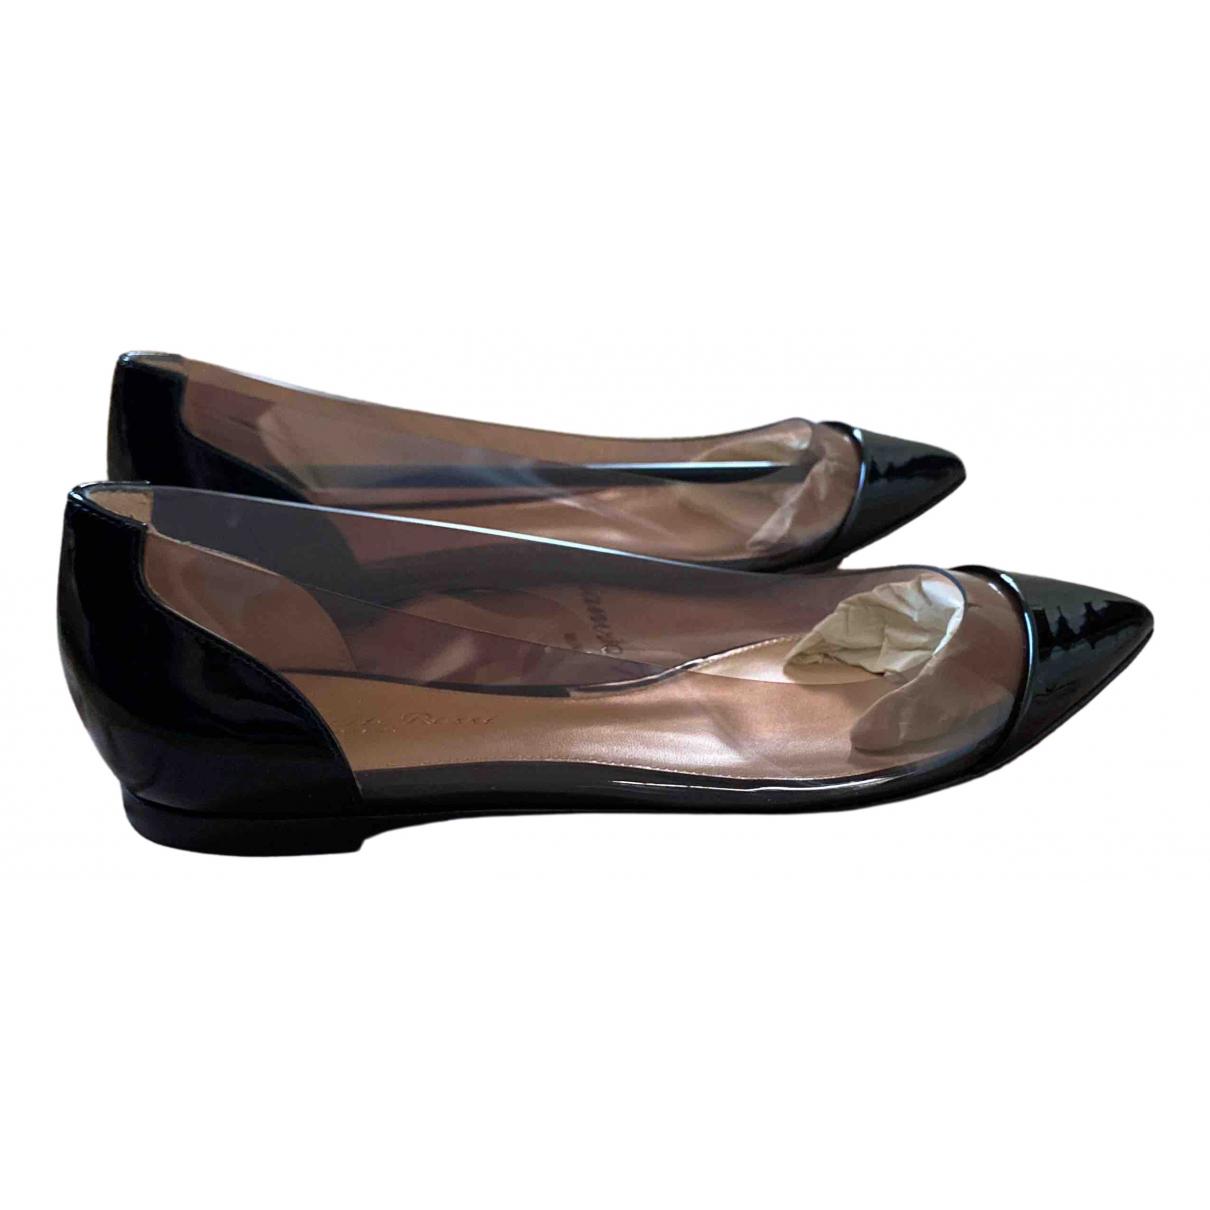 Gianvito Rossi - Ballerines Plexi pour femme en cuir verni - noir